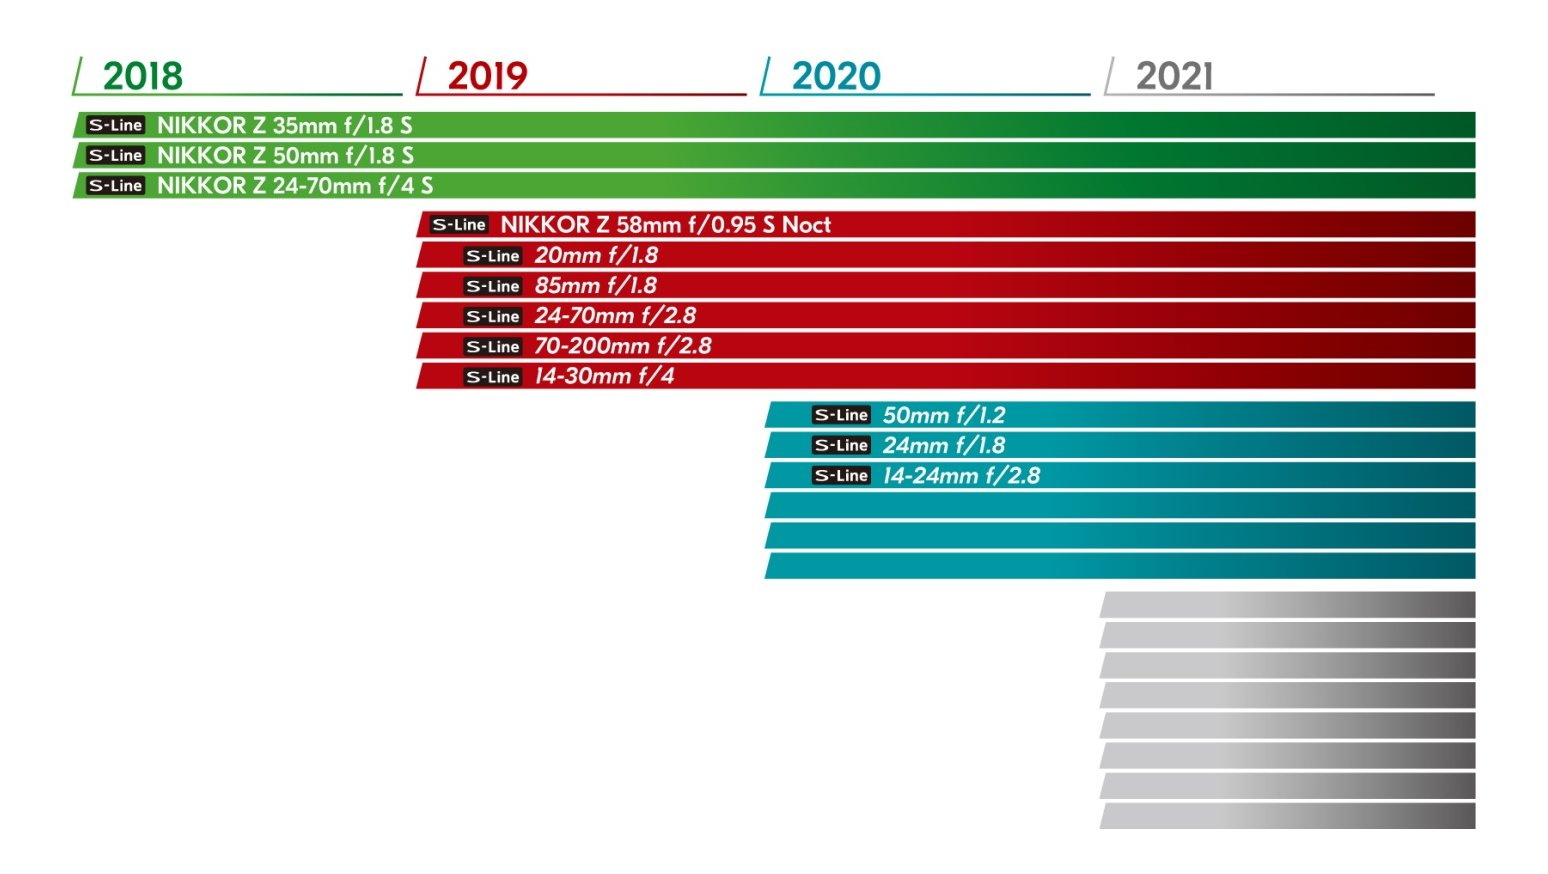 Nikon-S-Z-mount-lenses-chart